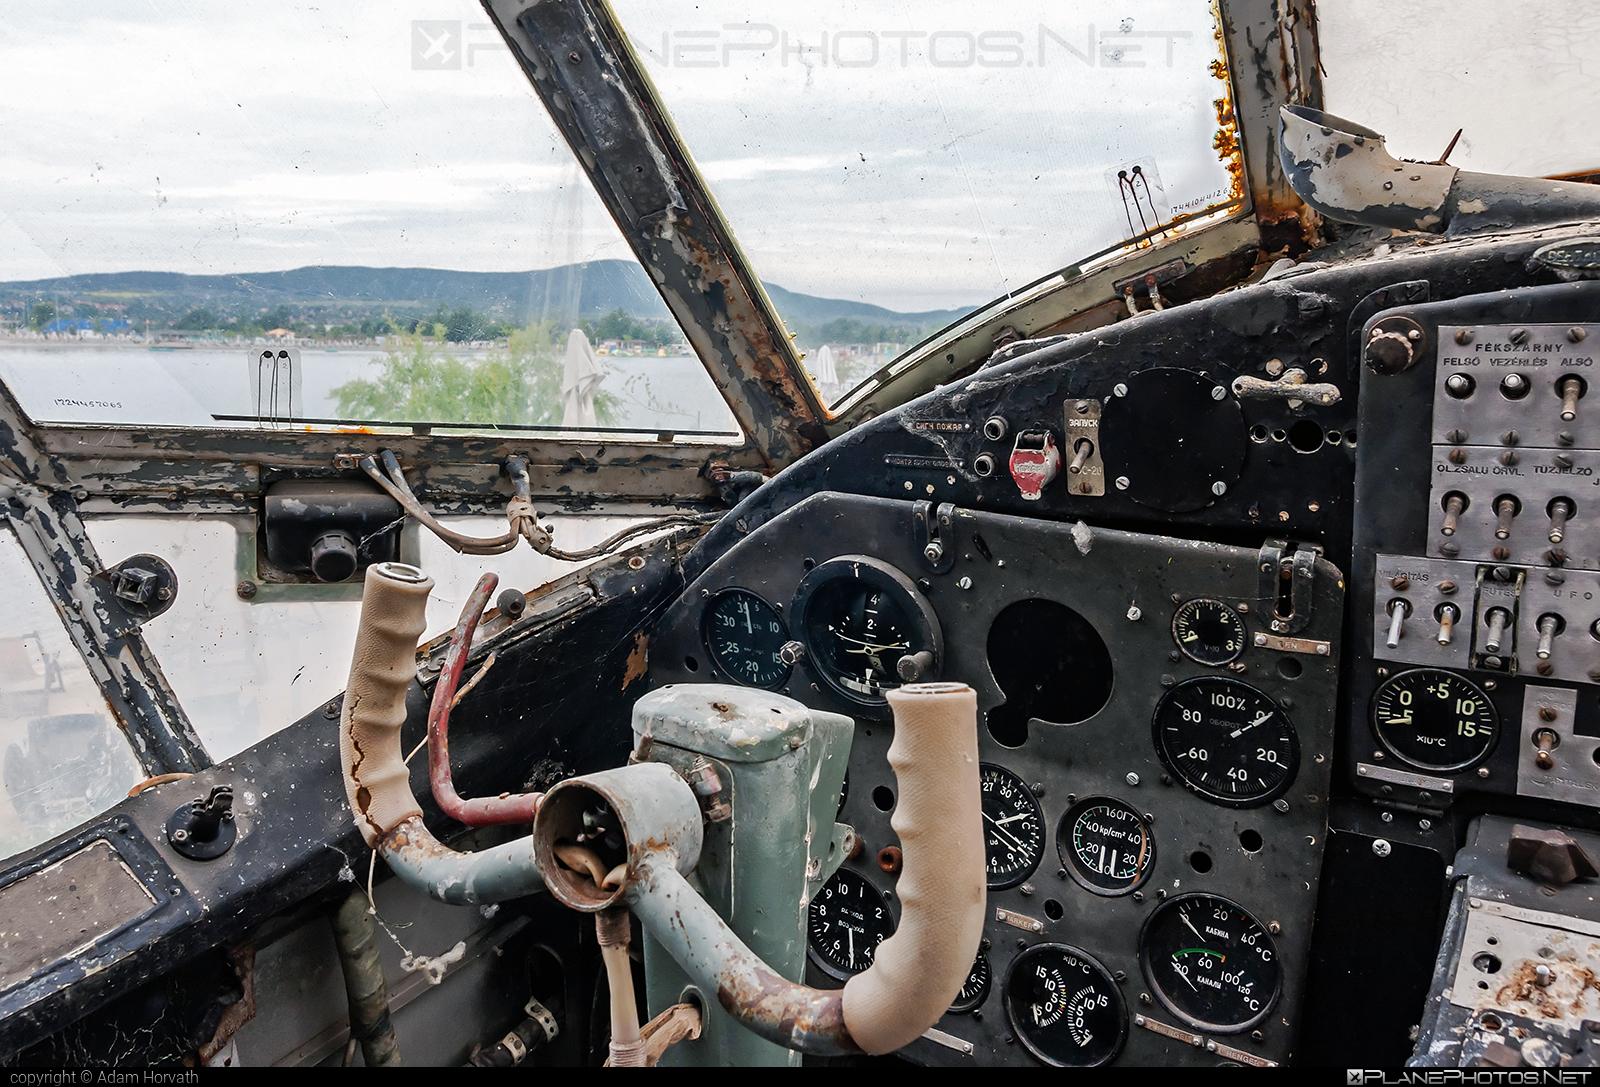 PZL-Mielec An-2R - No registration operated by Private operator #an2 #an2r #antonov2 #pzl #pzlmielec